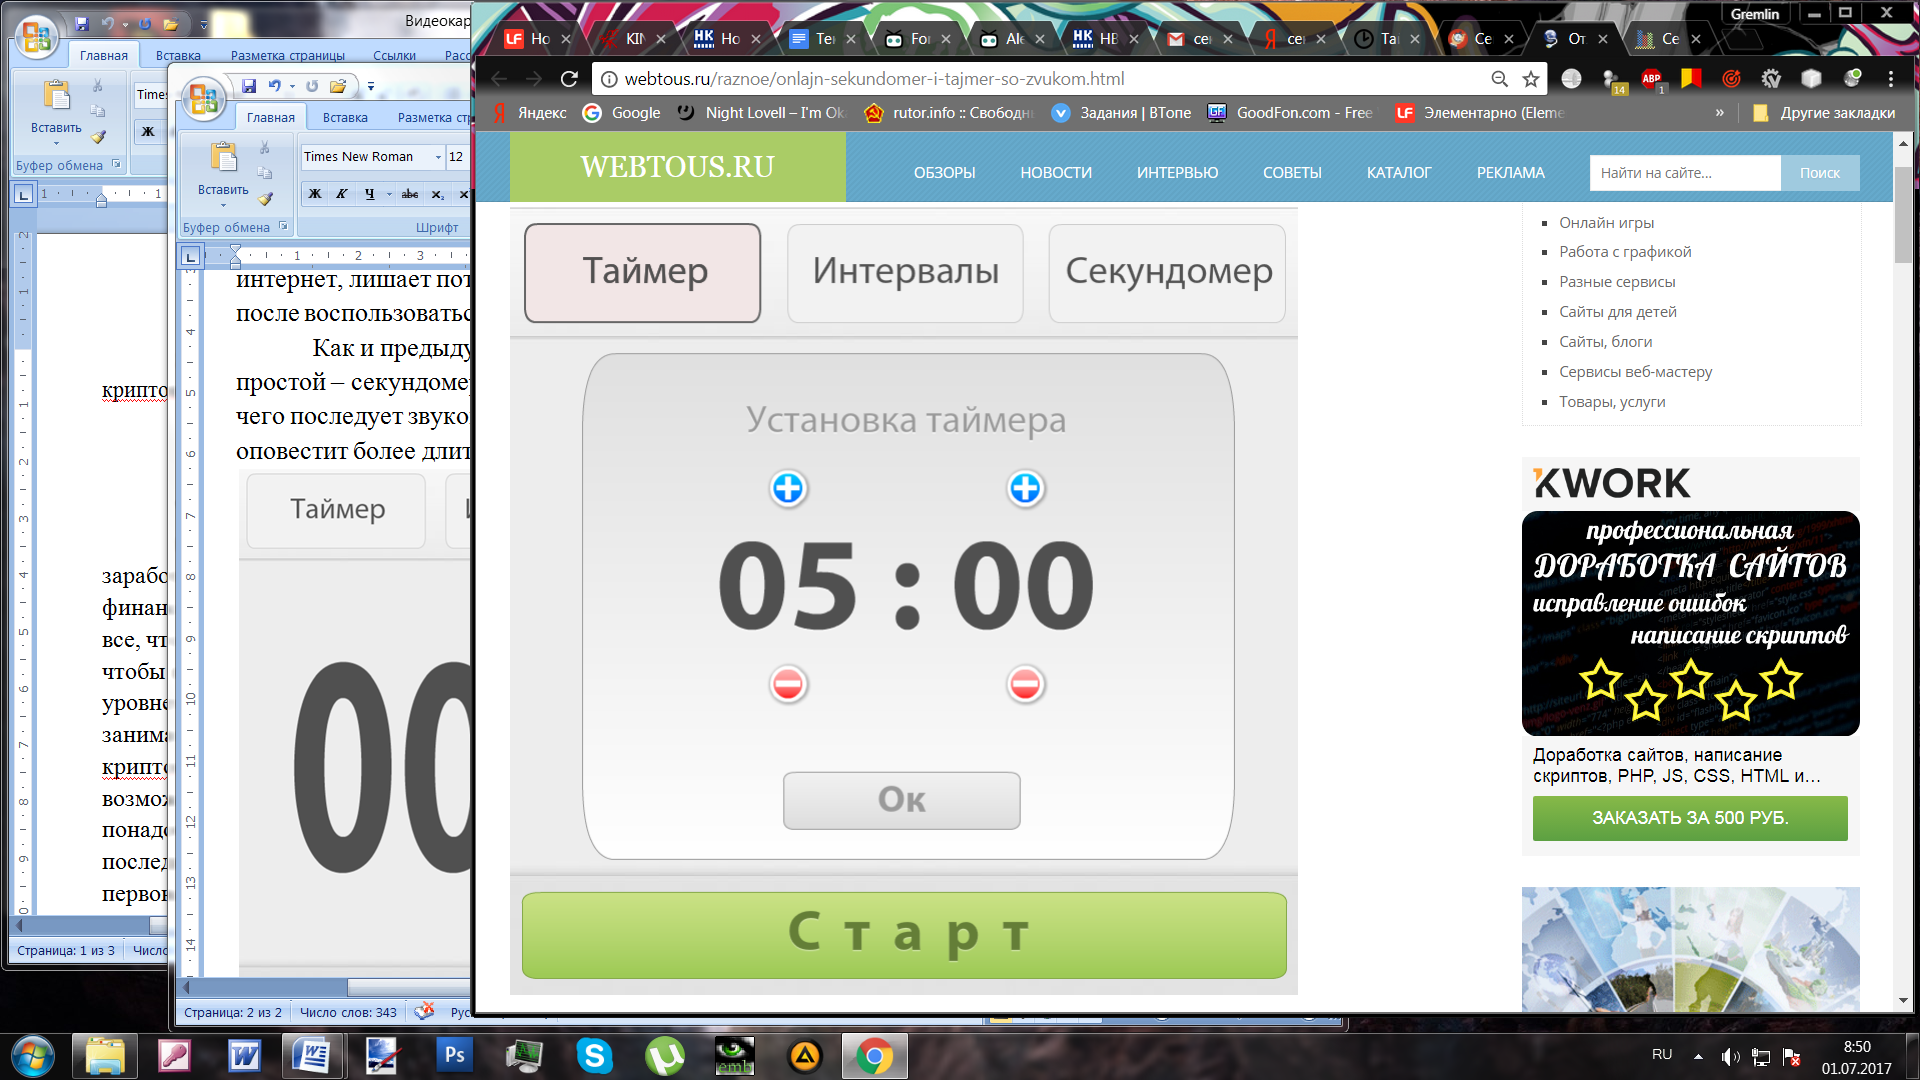 Таймер Webtous.ru